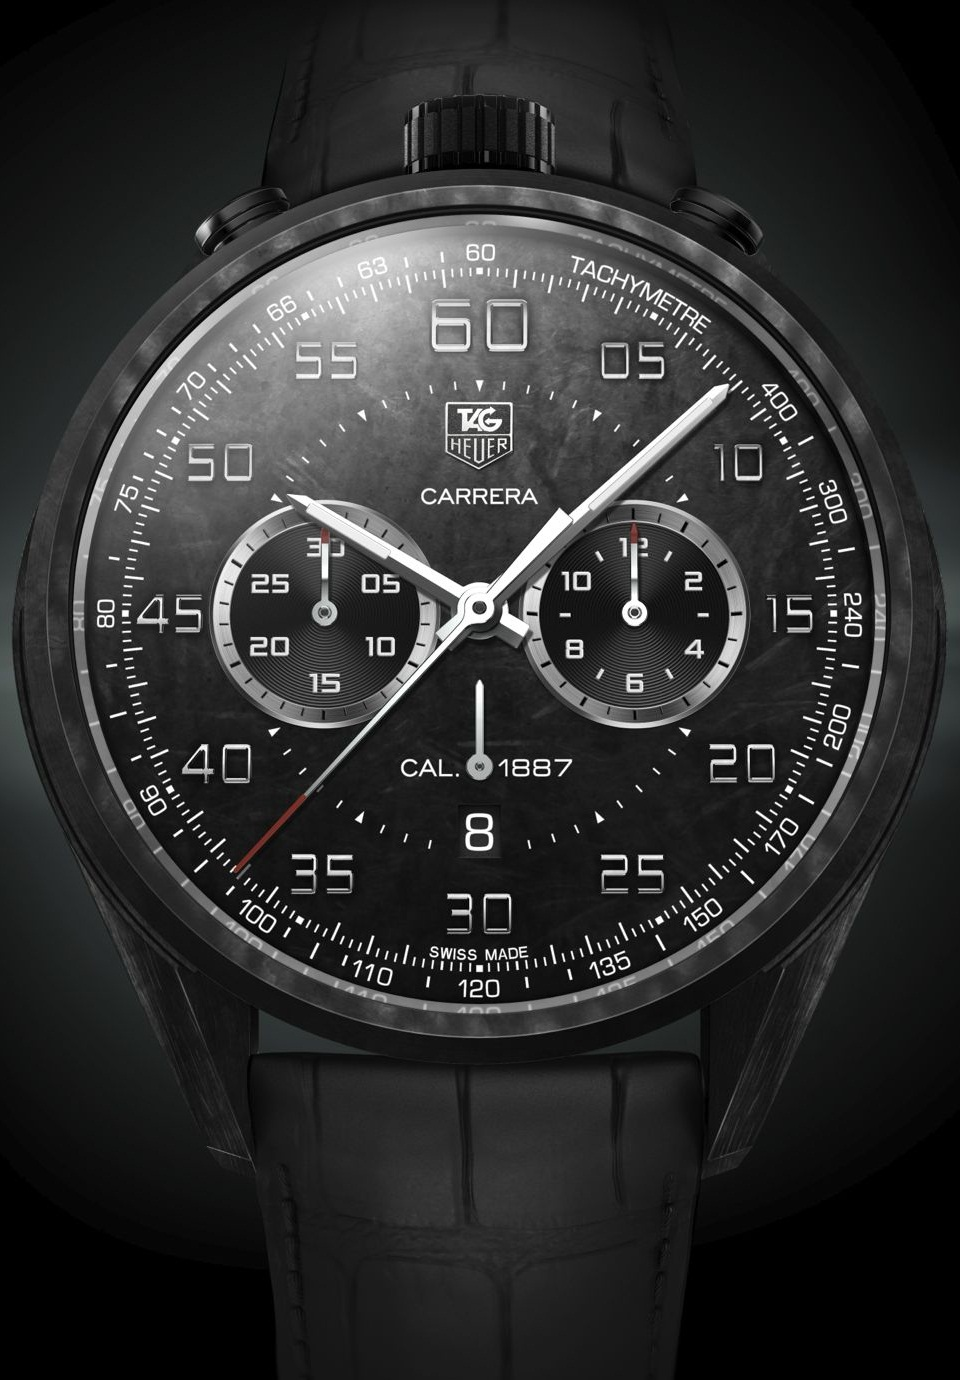 TAG Heuer Carrera Carbon Matrix Composite Concept Chronograph